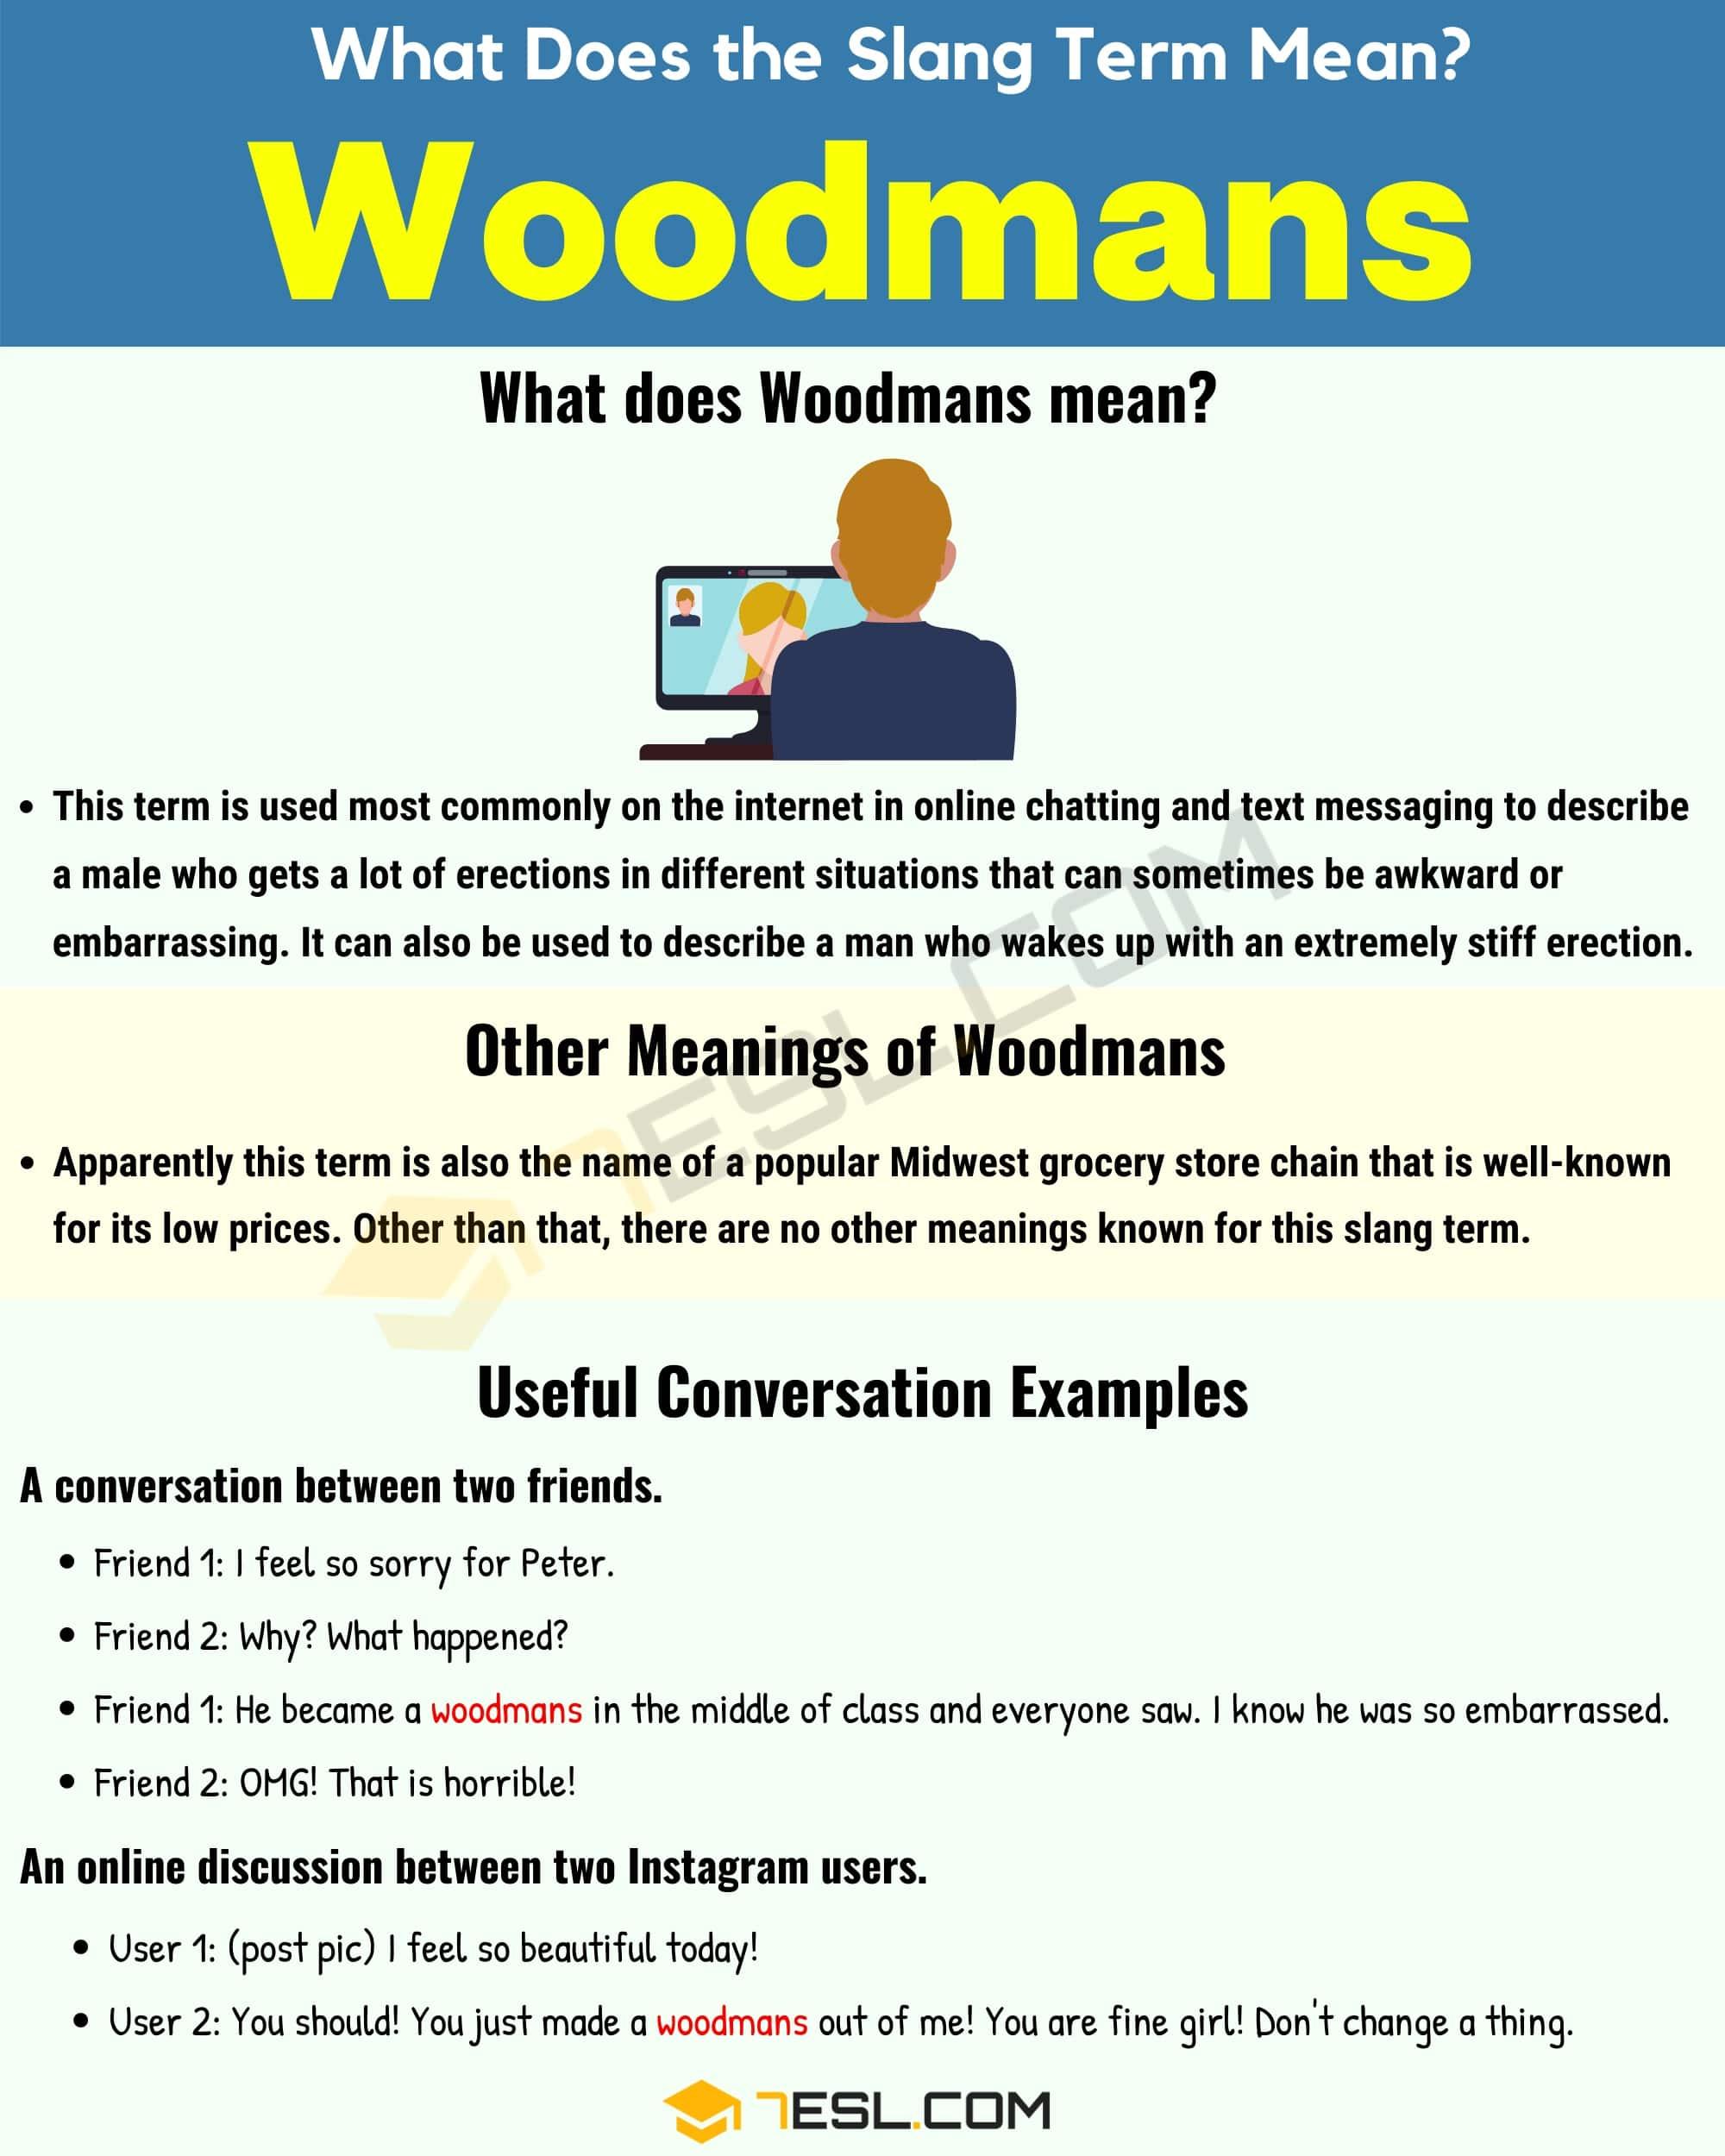 Woodmans